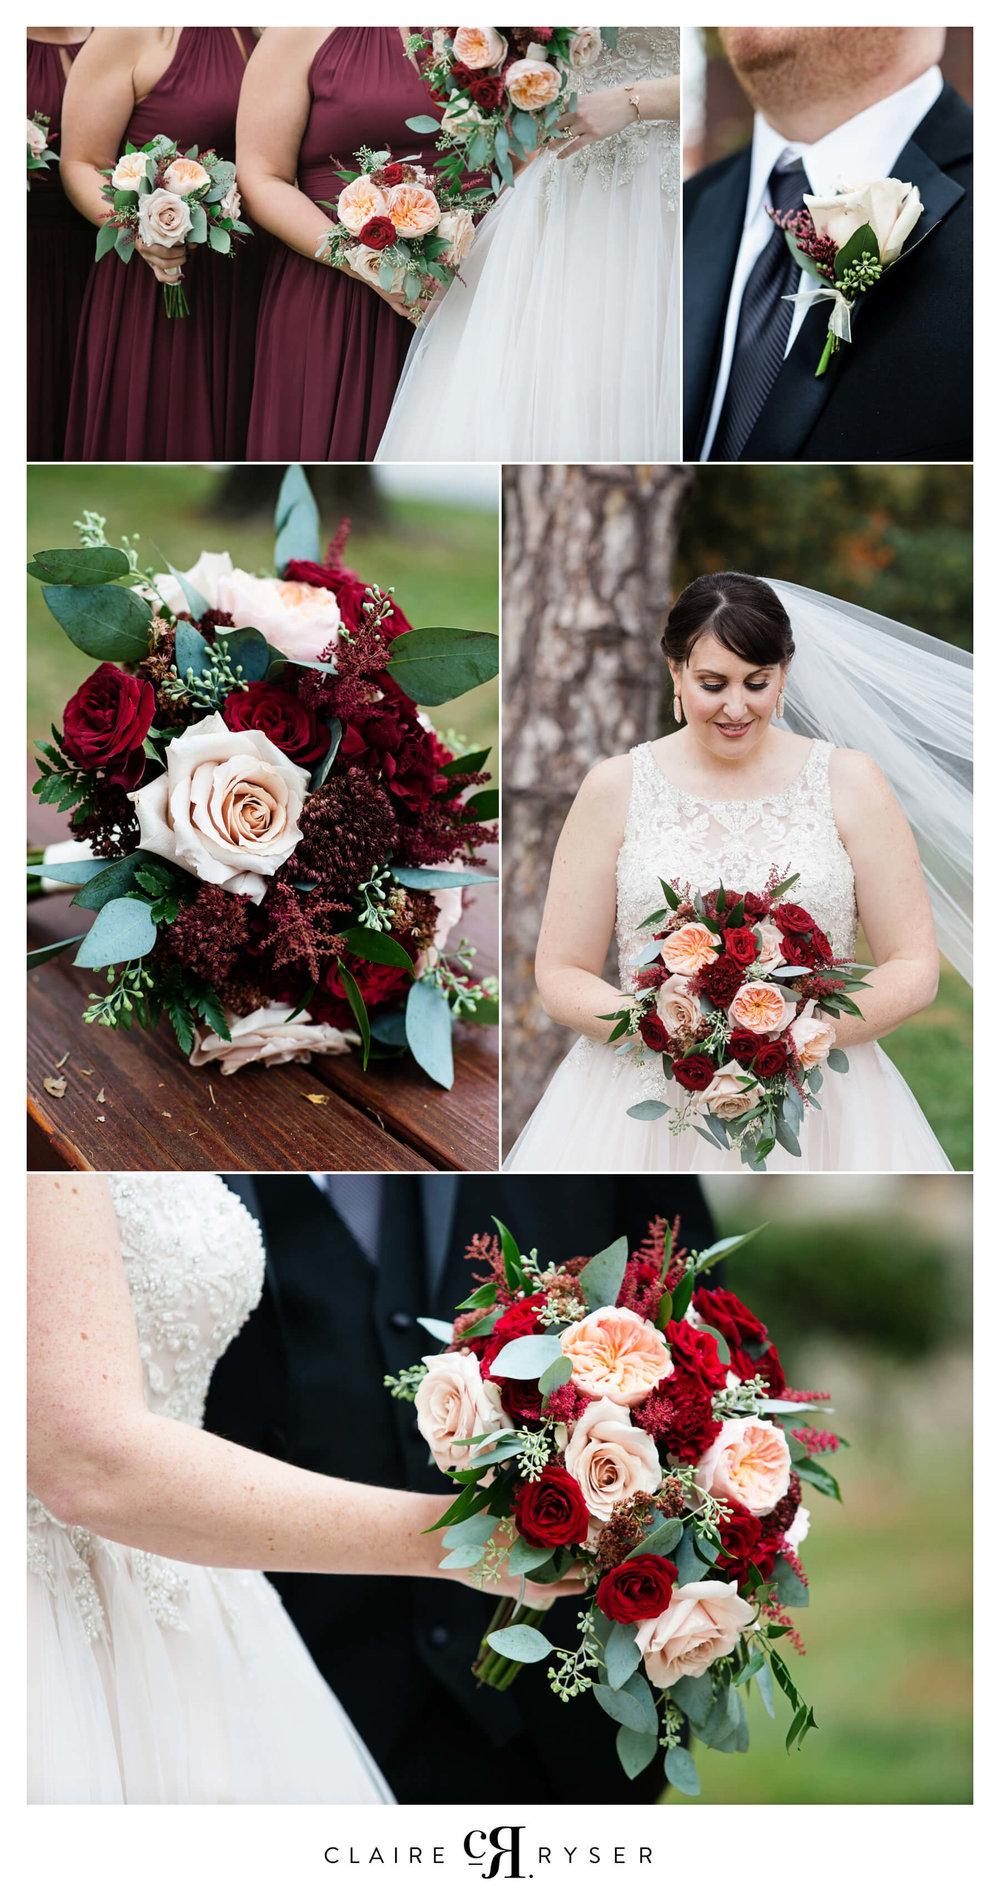 Kansas-City-Wedding-Photography-of-Wedding-Bouquet-Ideas-of_2017_ClaireRyser_02.JPG